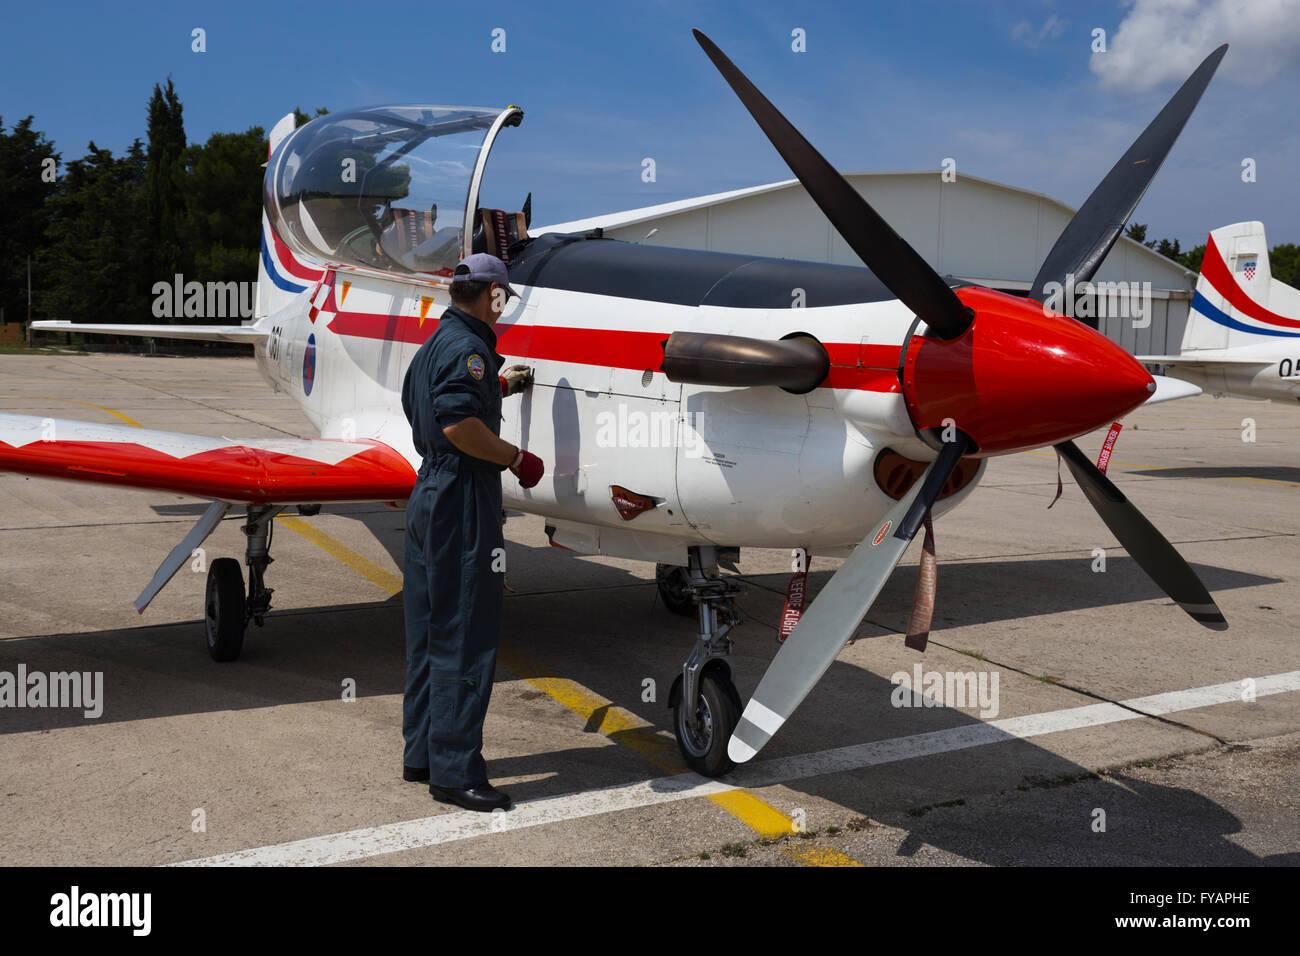 Aviation mechanic propeller training advanced Pilatus PC-9 Red propeller-driven turboprop Stock Photo